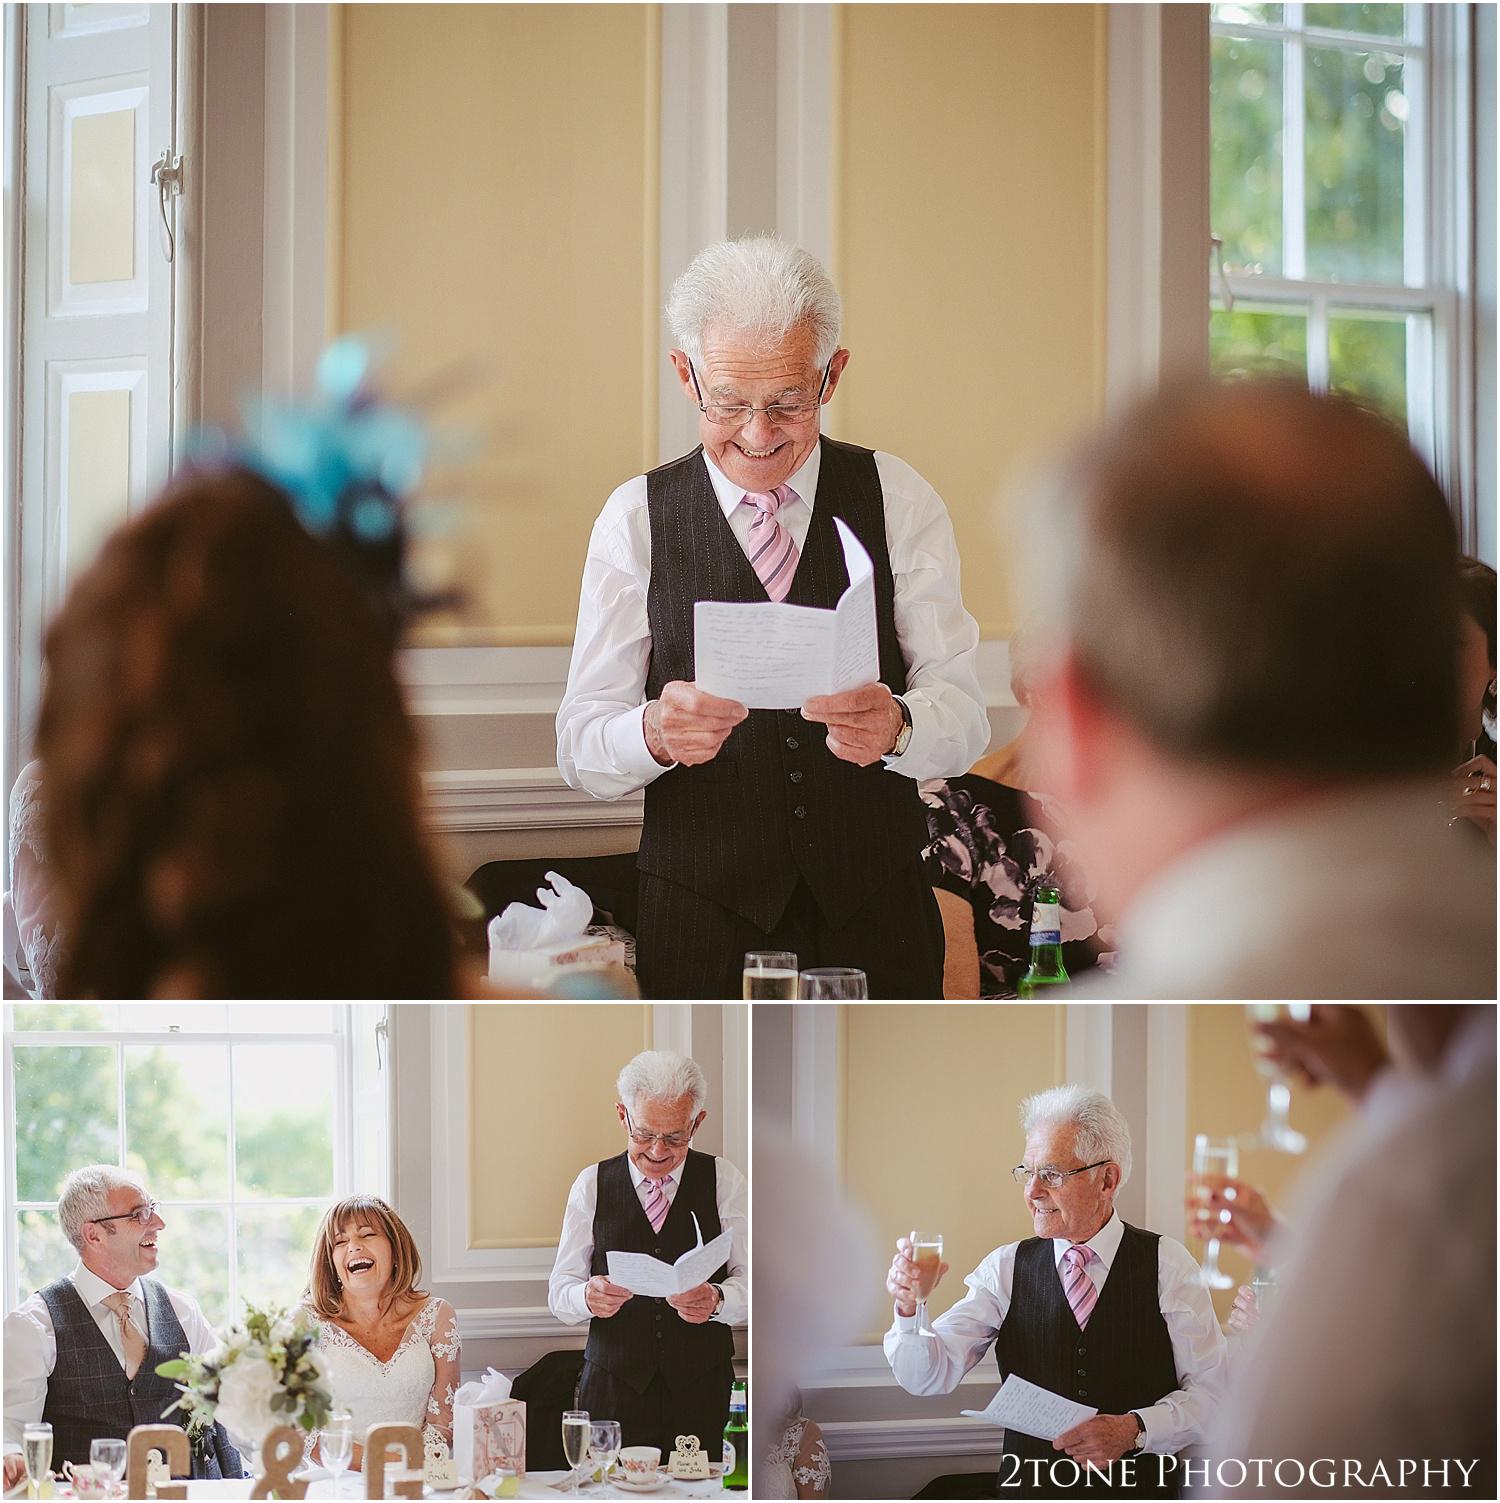 Crook Hall wedding photographer 050.jpg